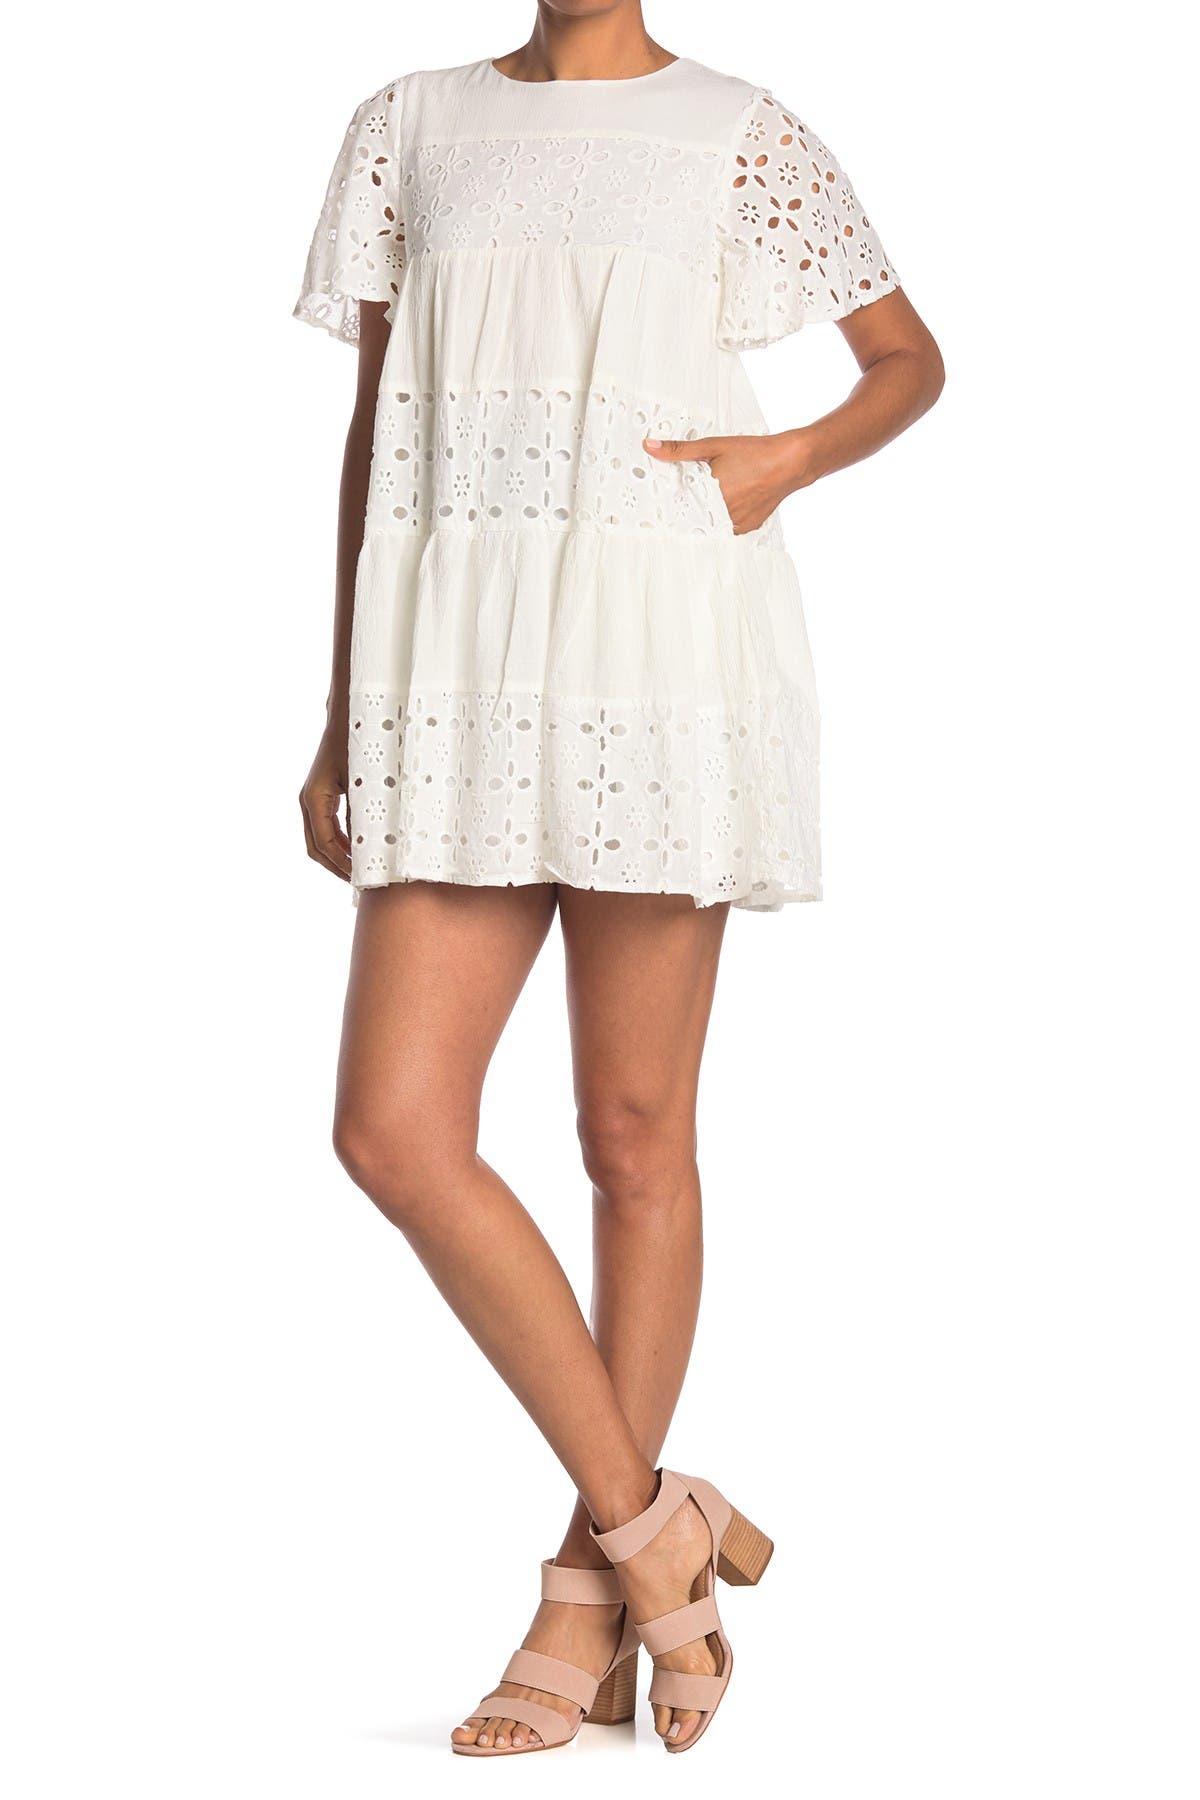 Image of MELLODAY Flutter Sleeve Eyelet Babydoll Dress